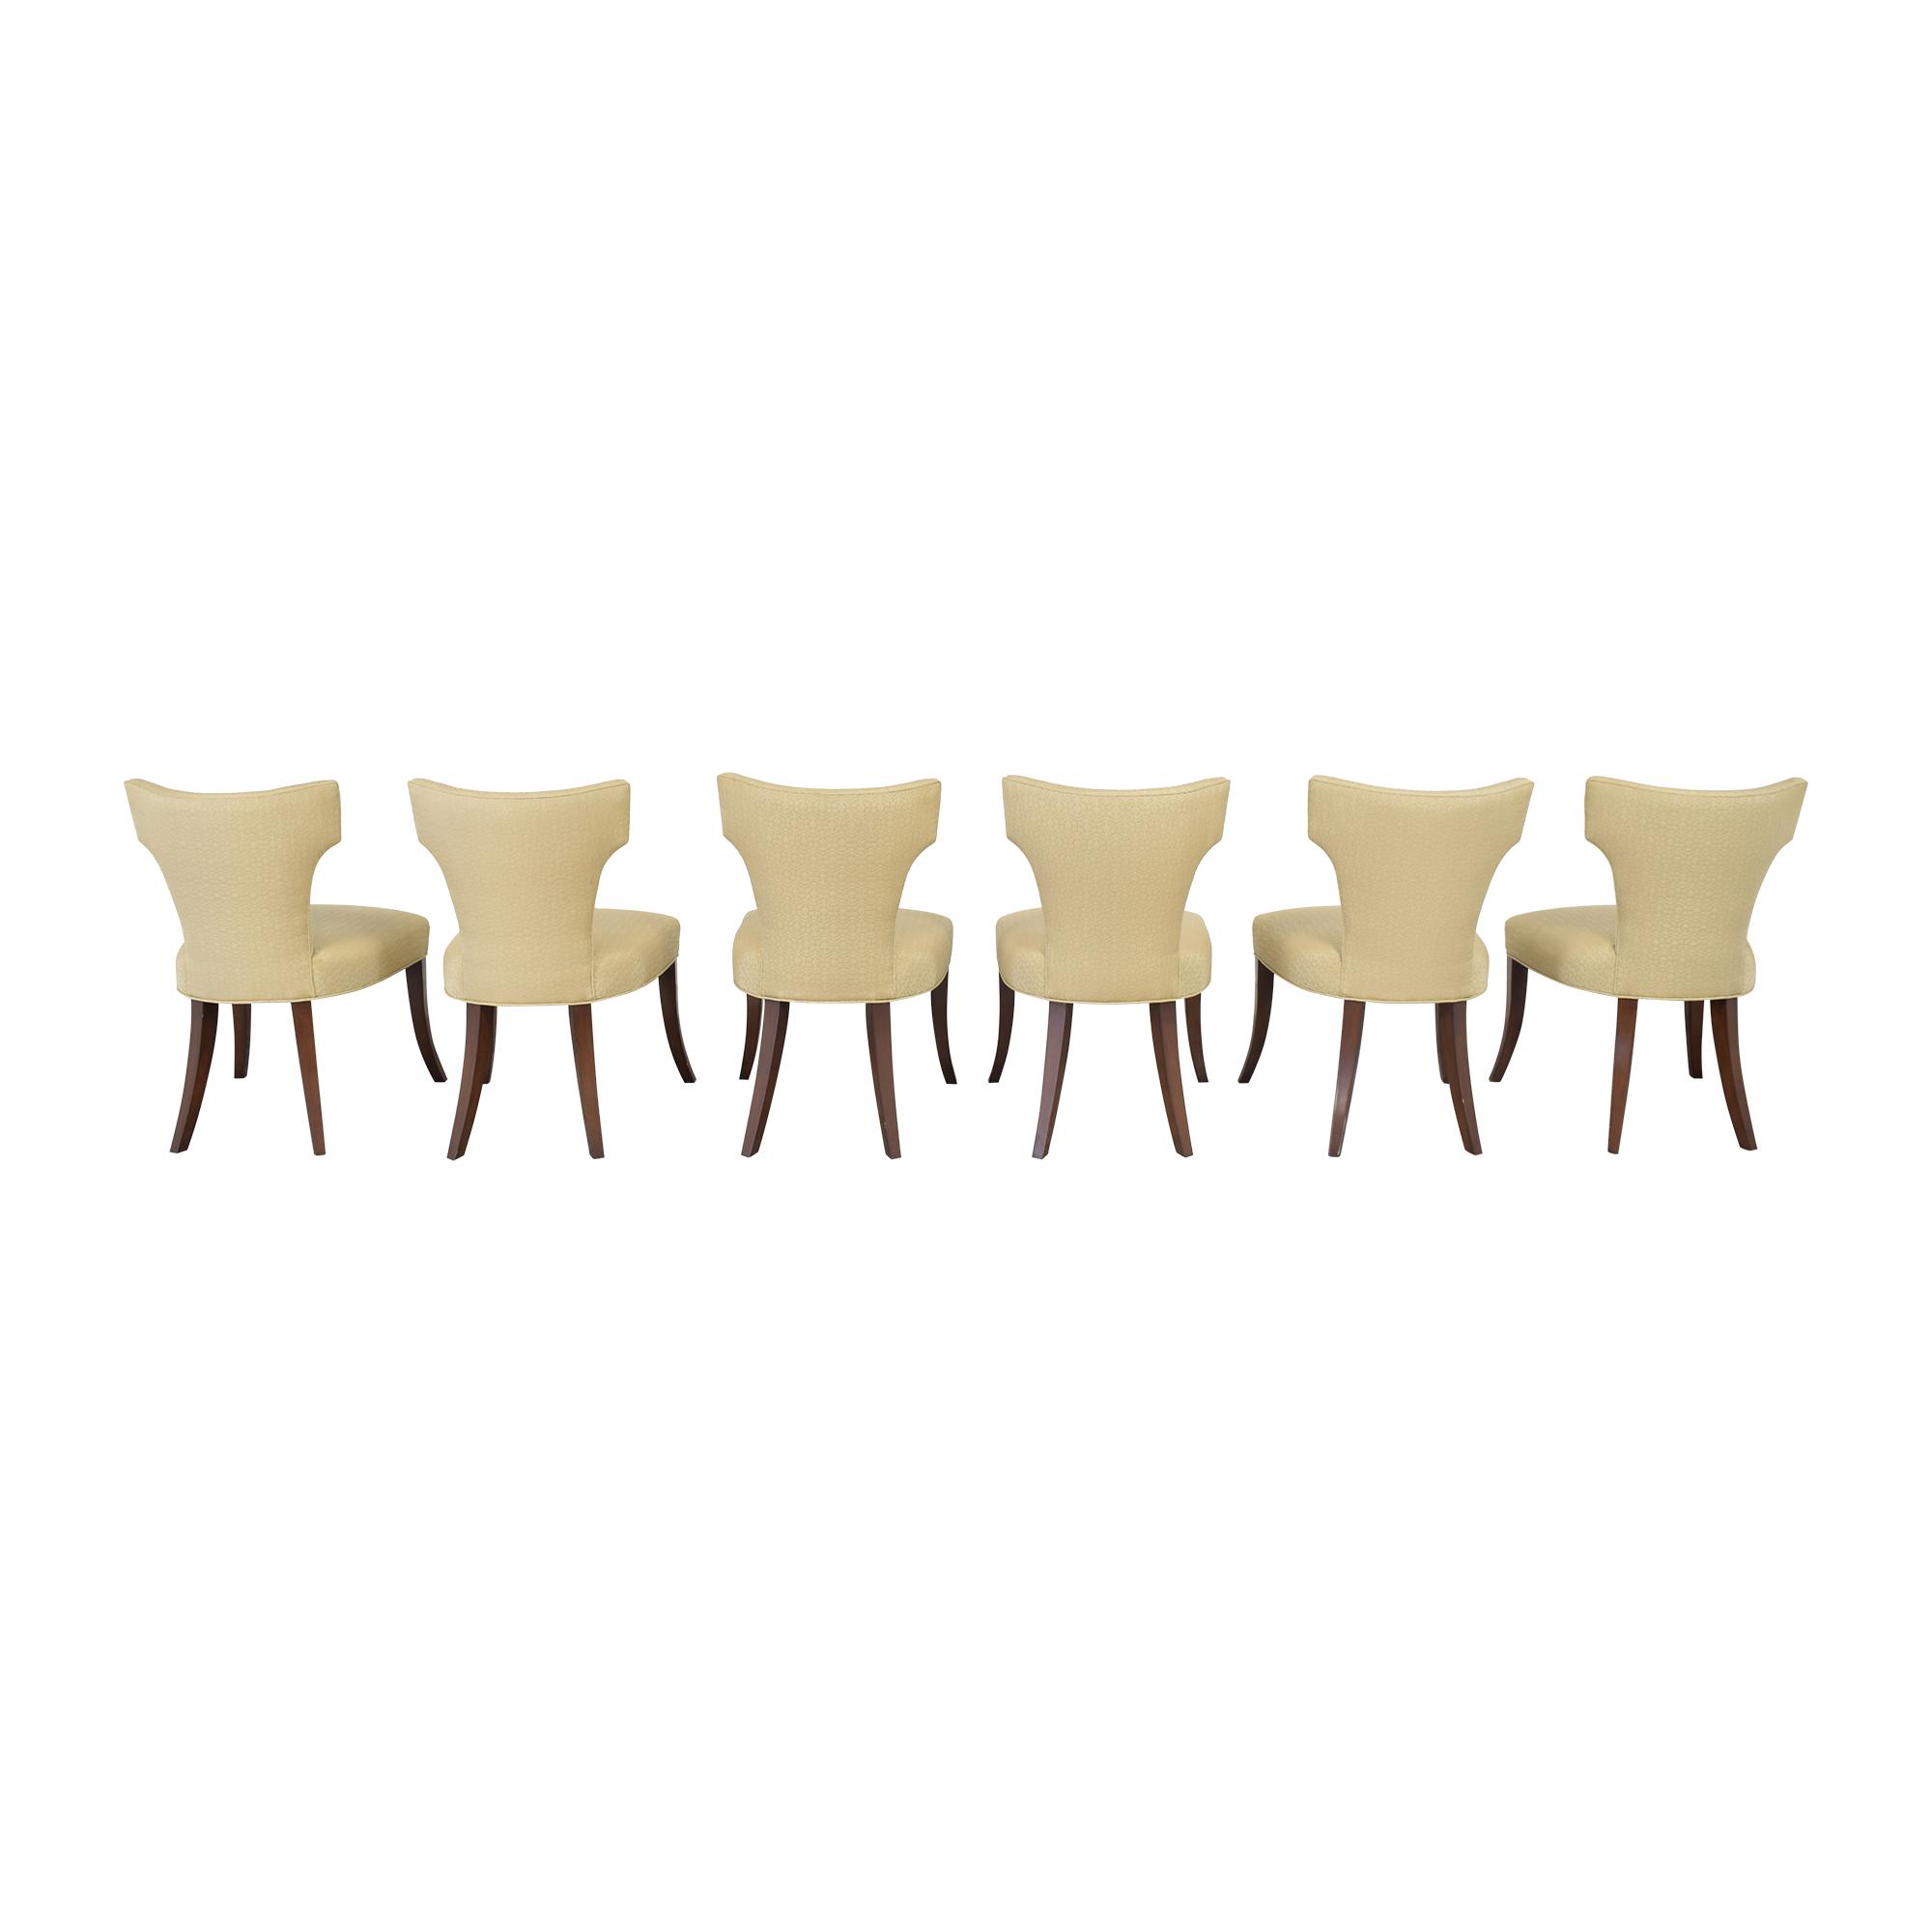 Ferrell Mittman Ferrell Mittman Custom Wing Dining Chairs used